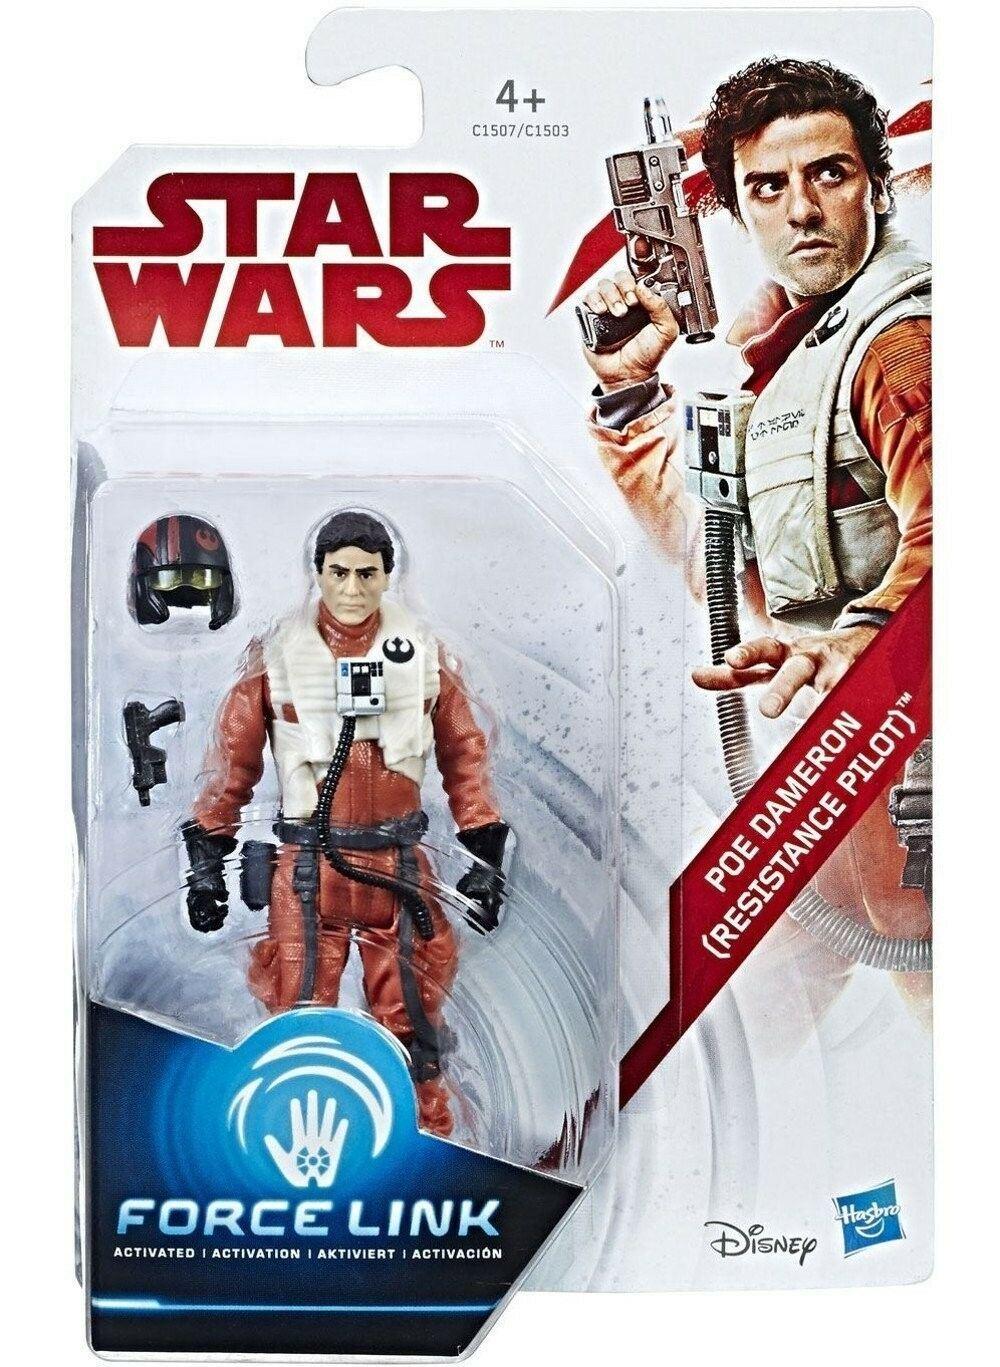 Star Wars Poe Dameron Resistance Pilot Force Link Figure